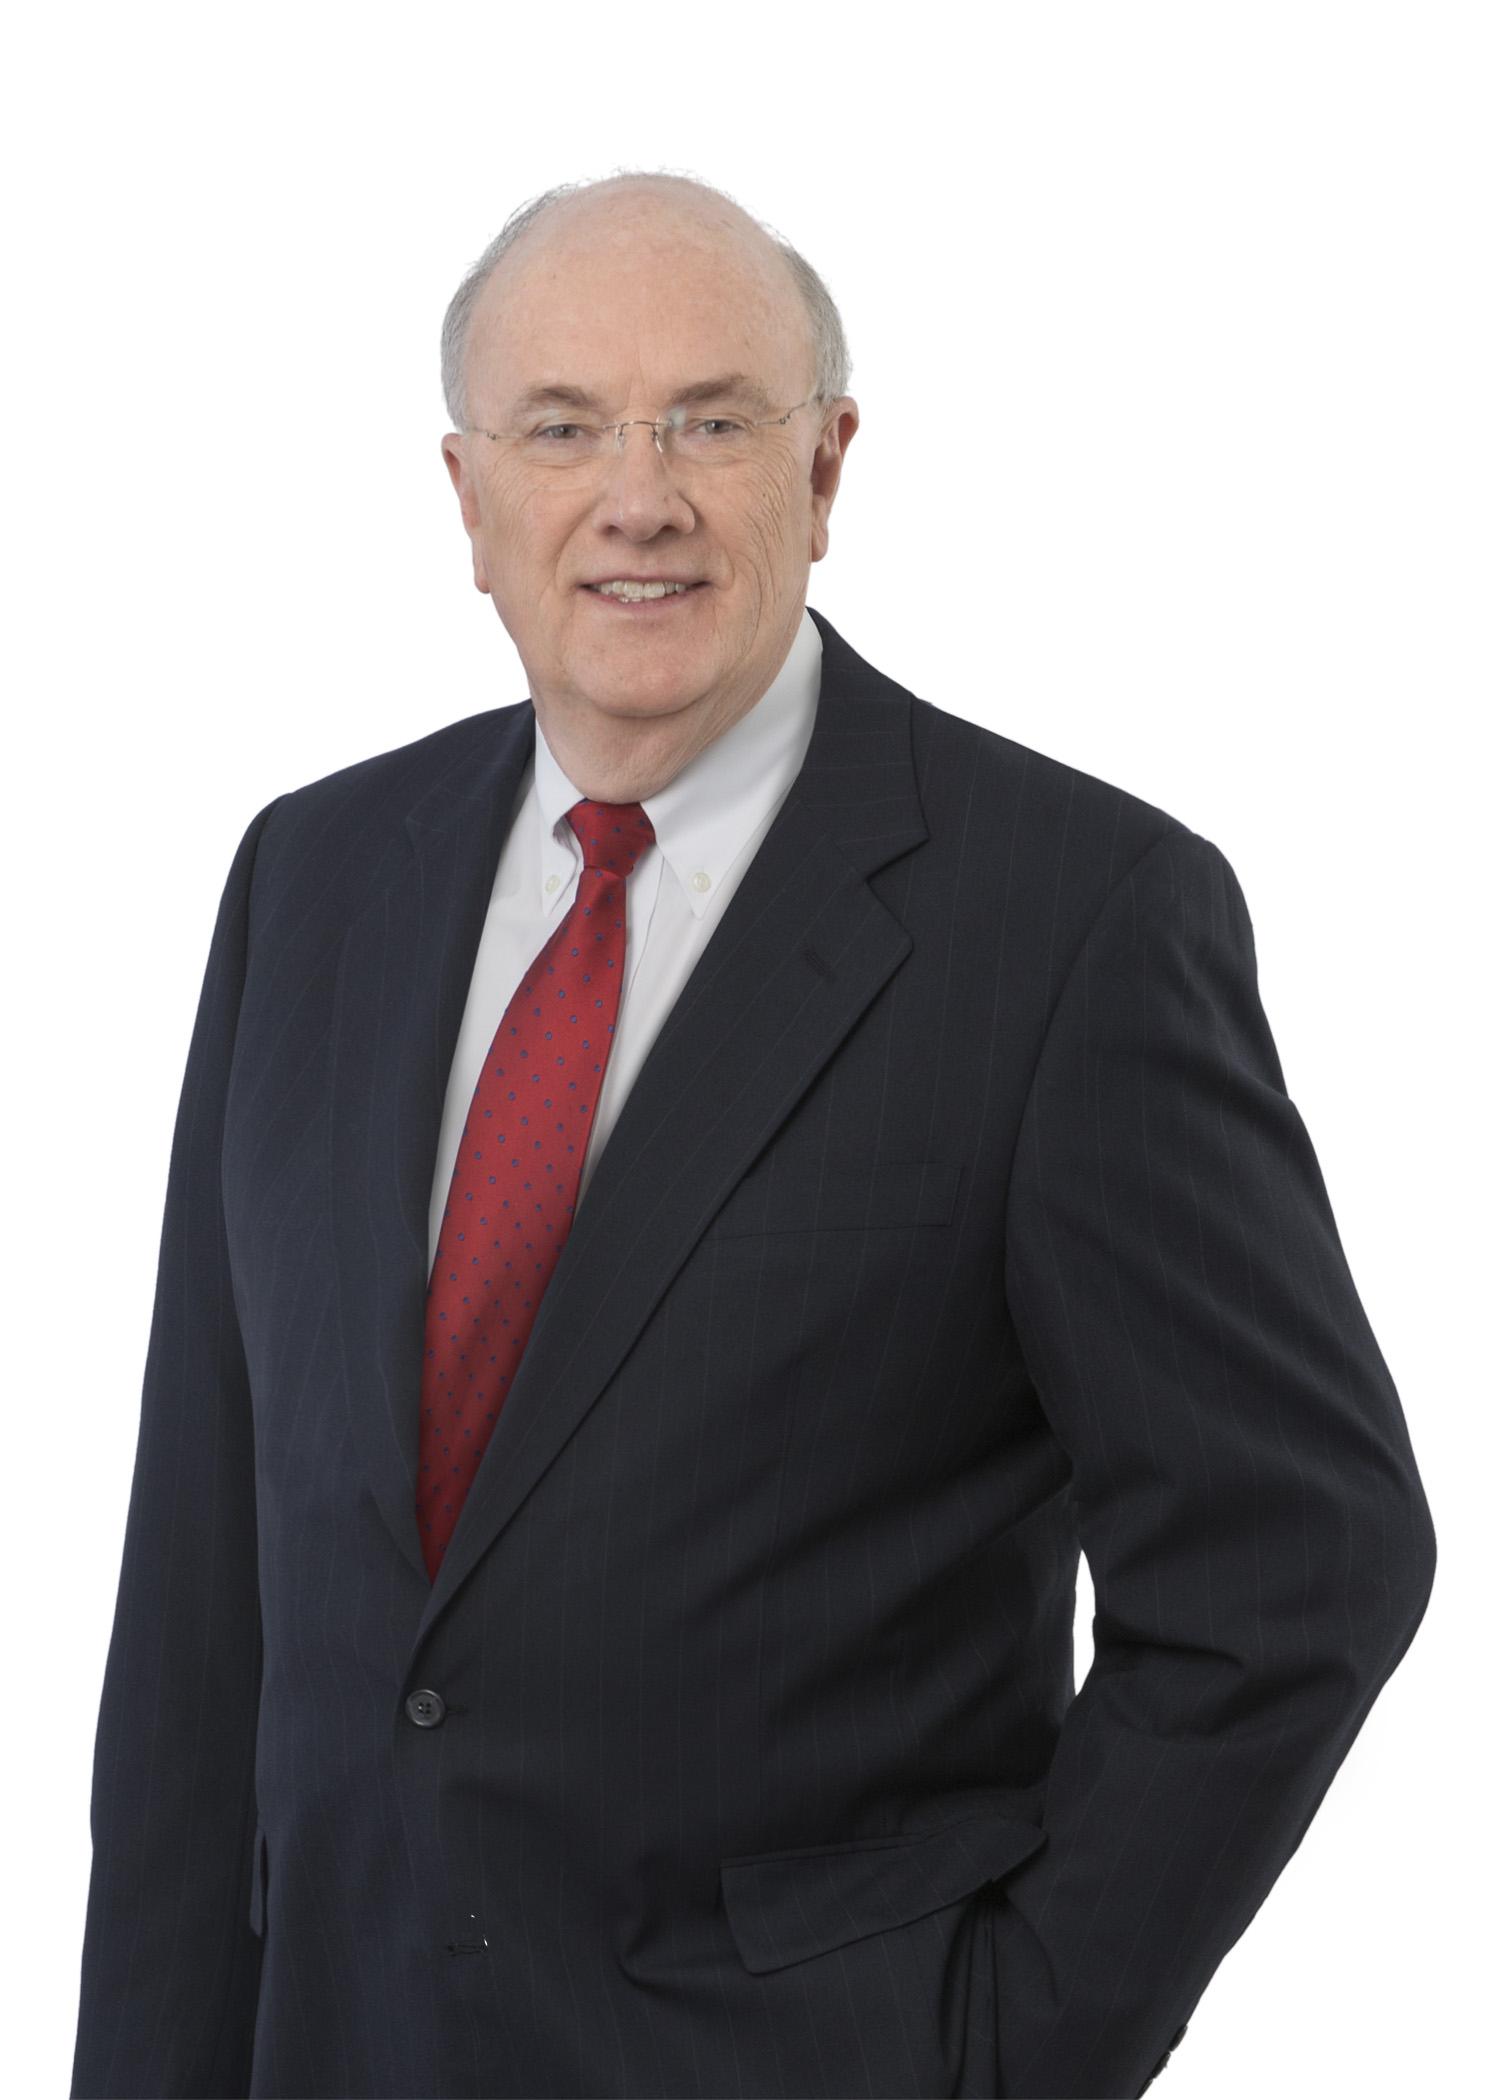 Keith Short